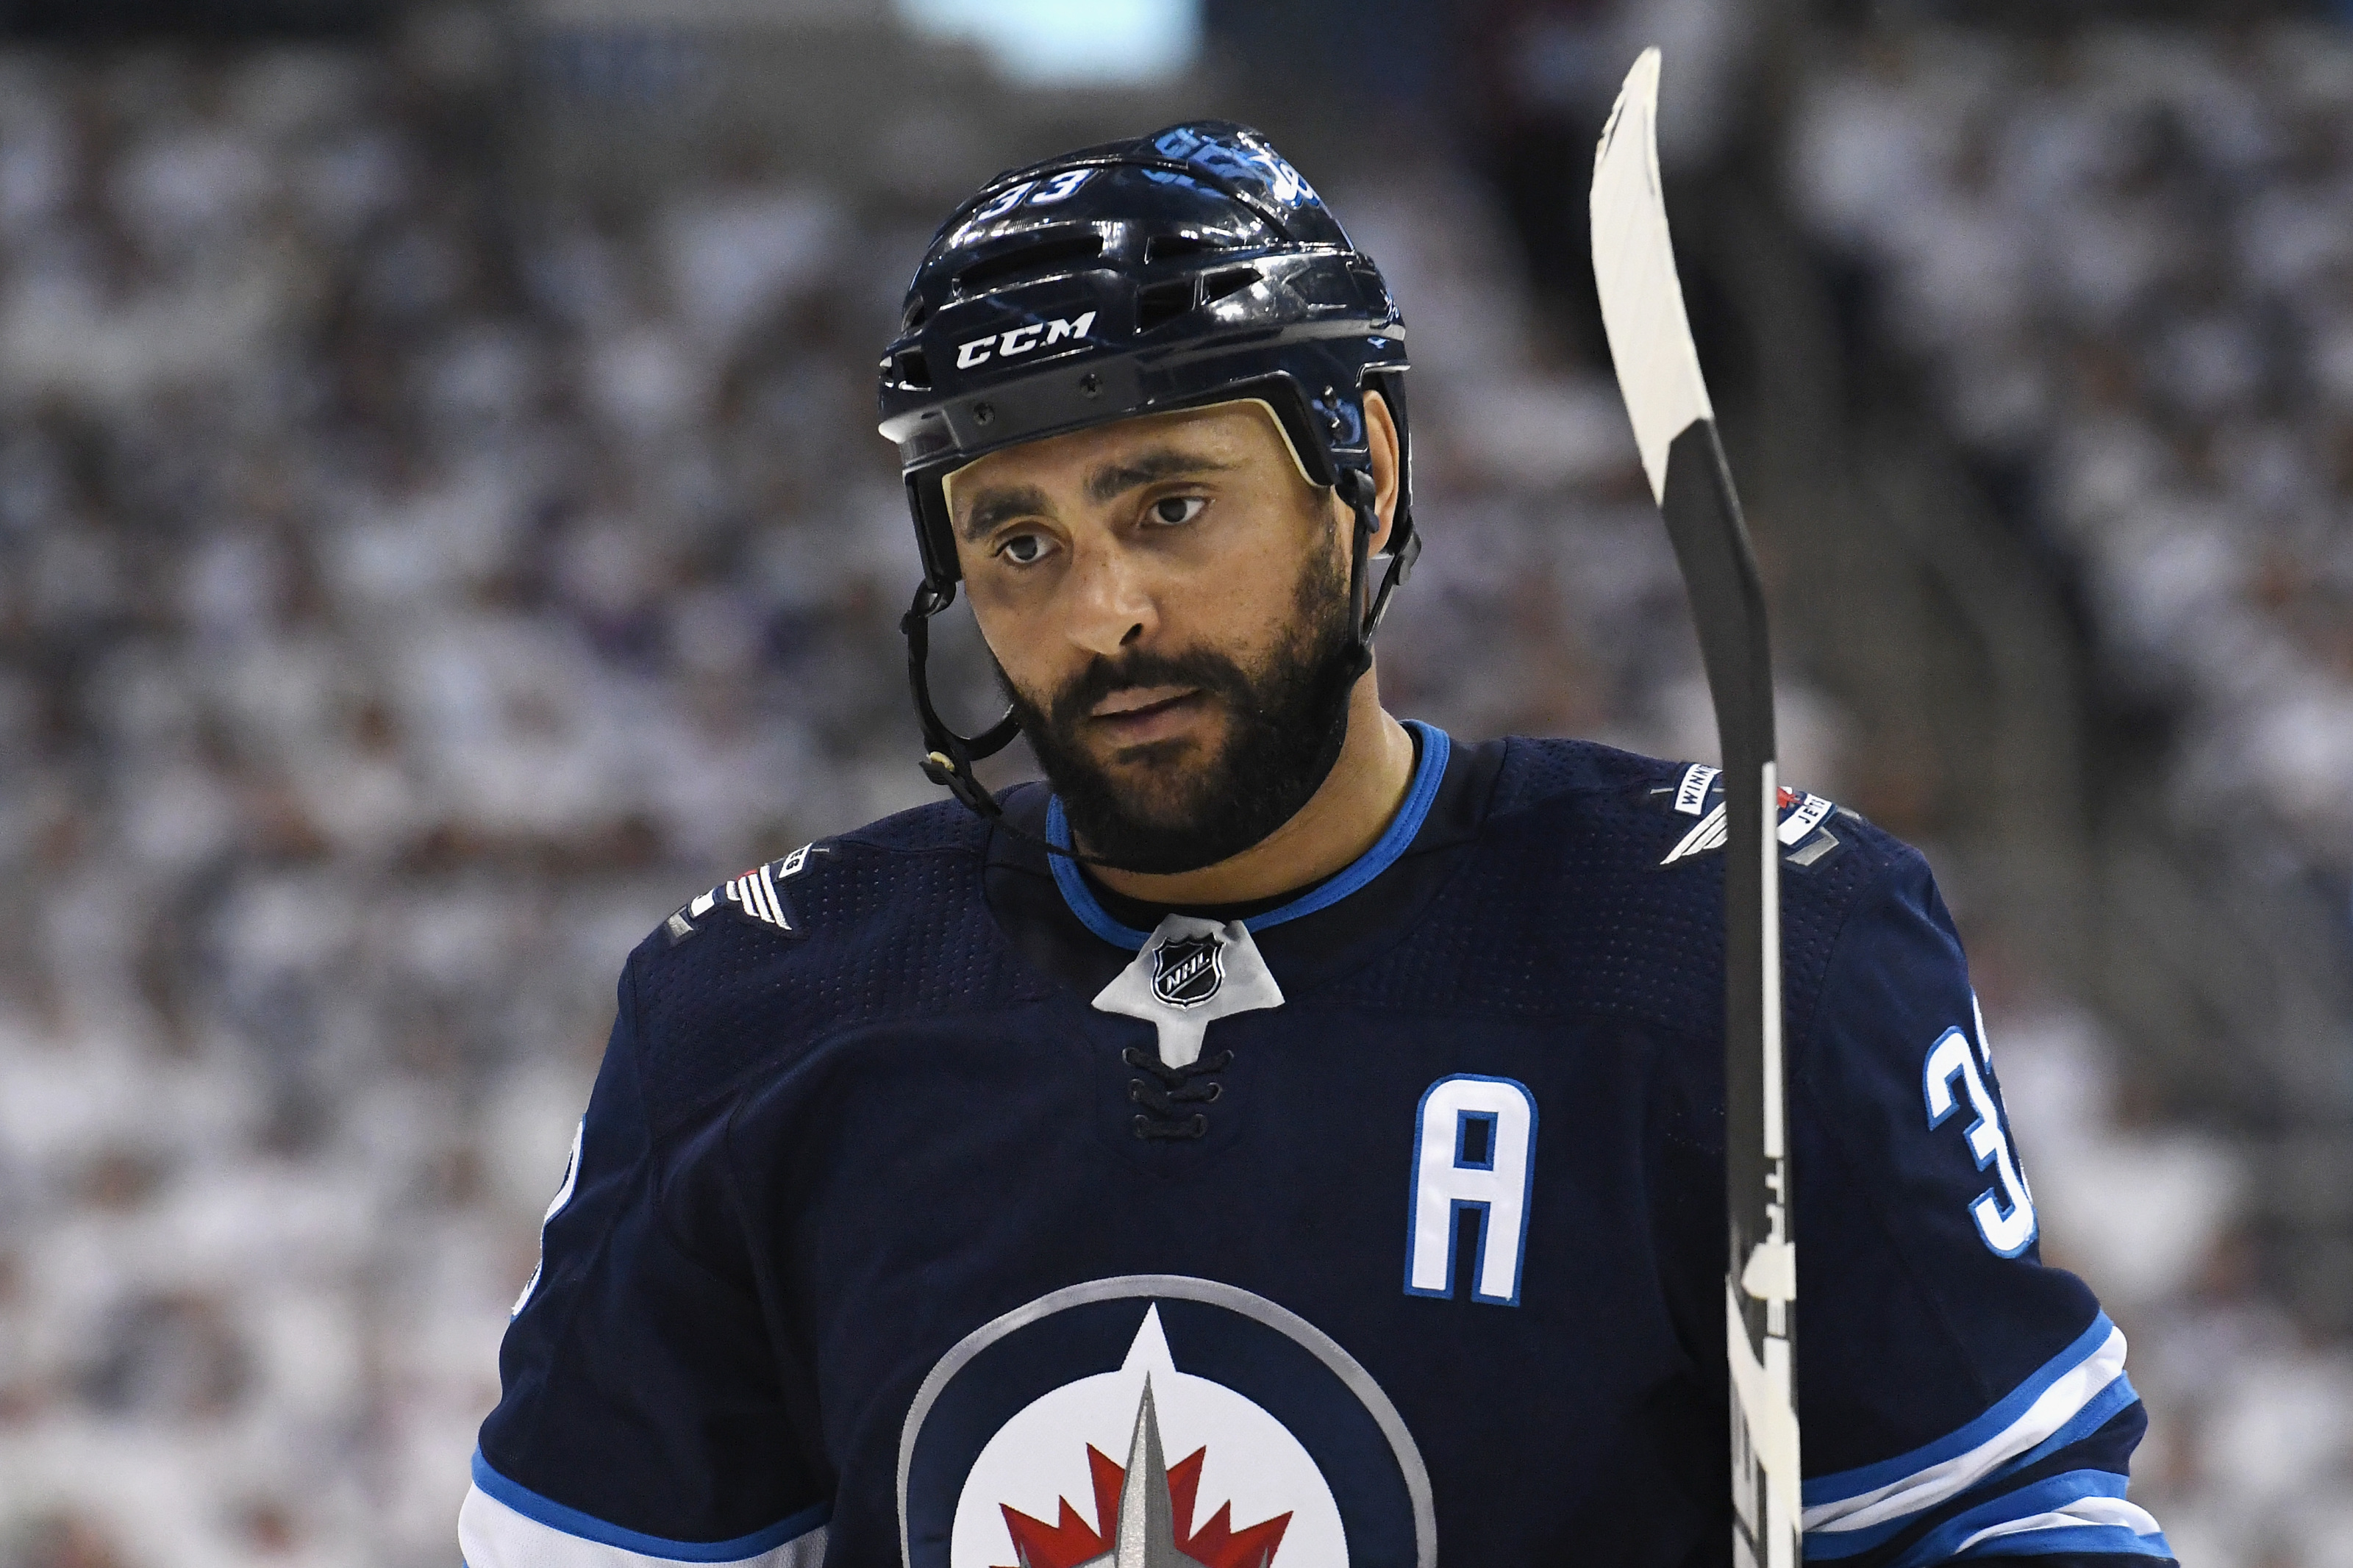 Winnipeg Jets Dustin Byfuglien Is The Most Interesting Trade Target